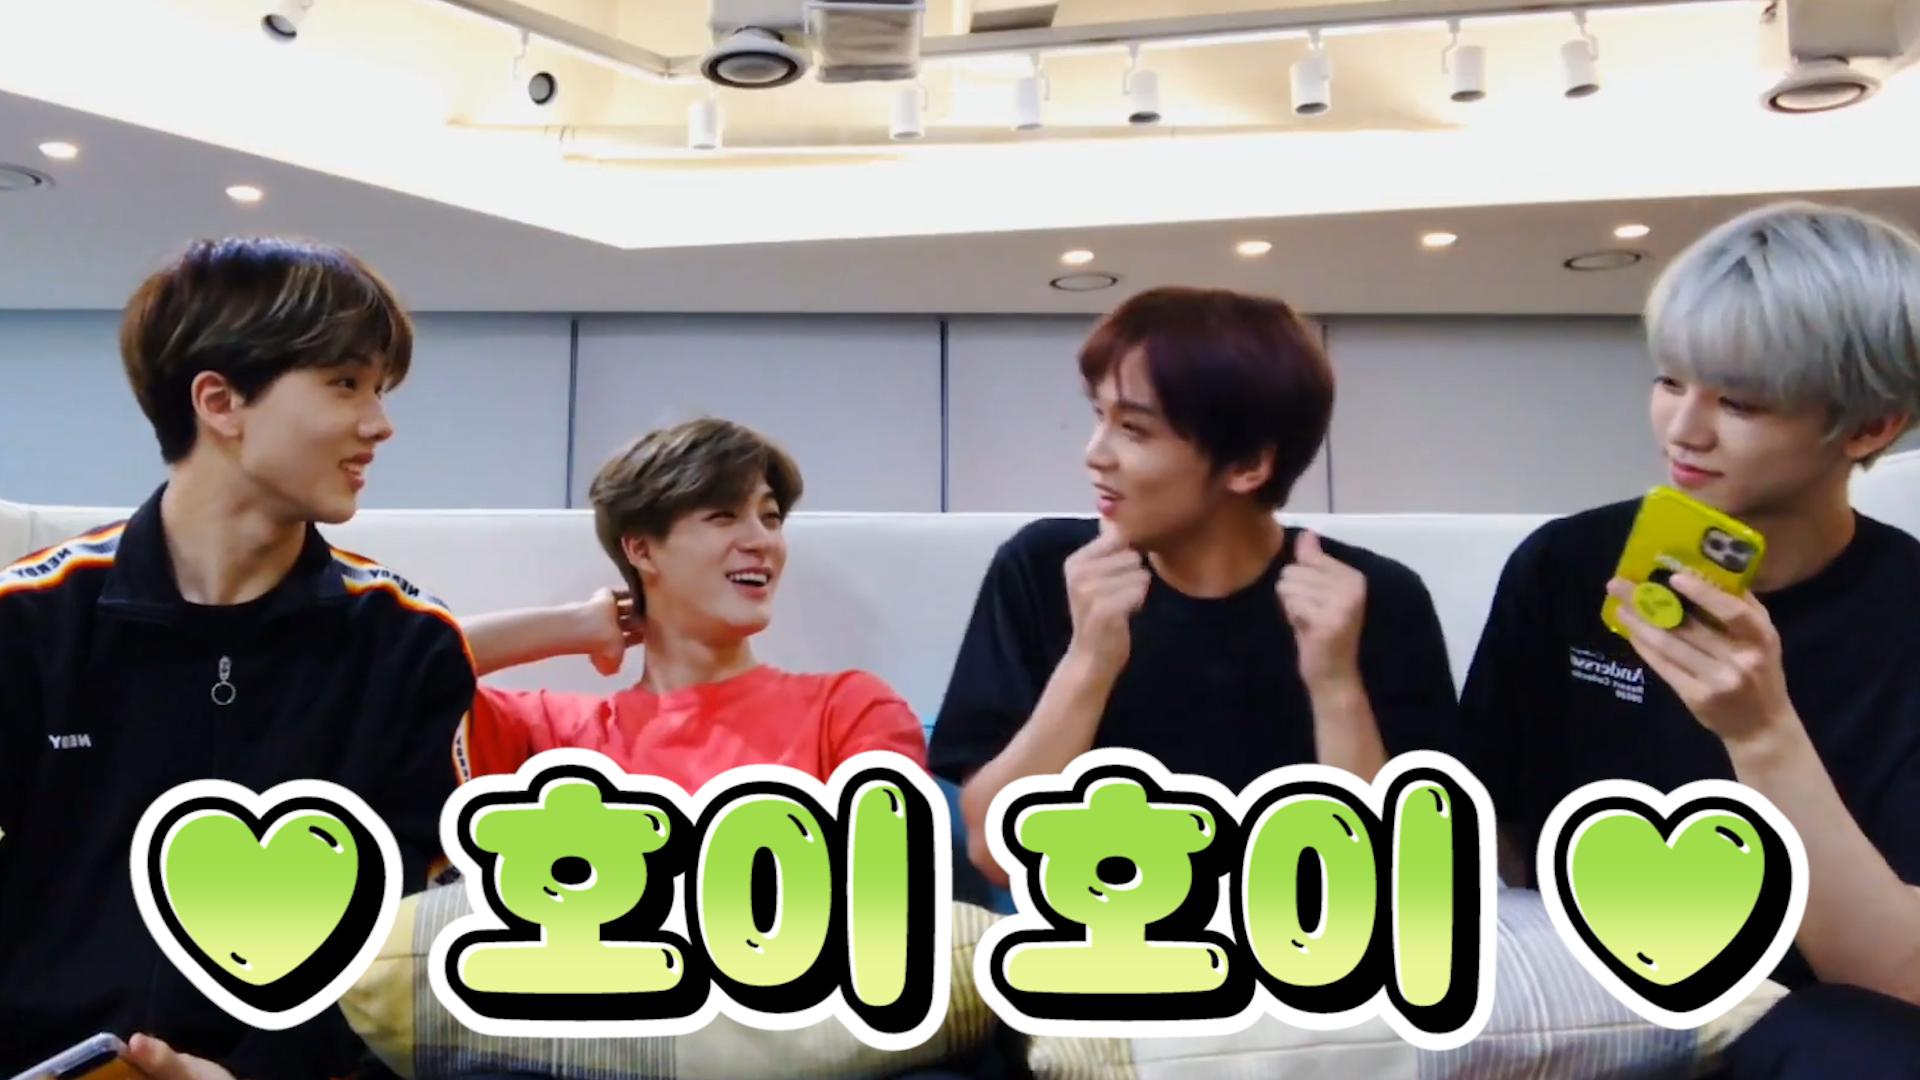 [NCT] ❣️호이 호이❣️ 천국 채널 다이렉트 연결주문이거든요🔮📺(NCT talking about old-fashioned snacks)